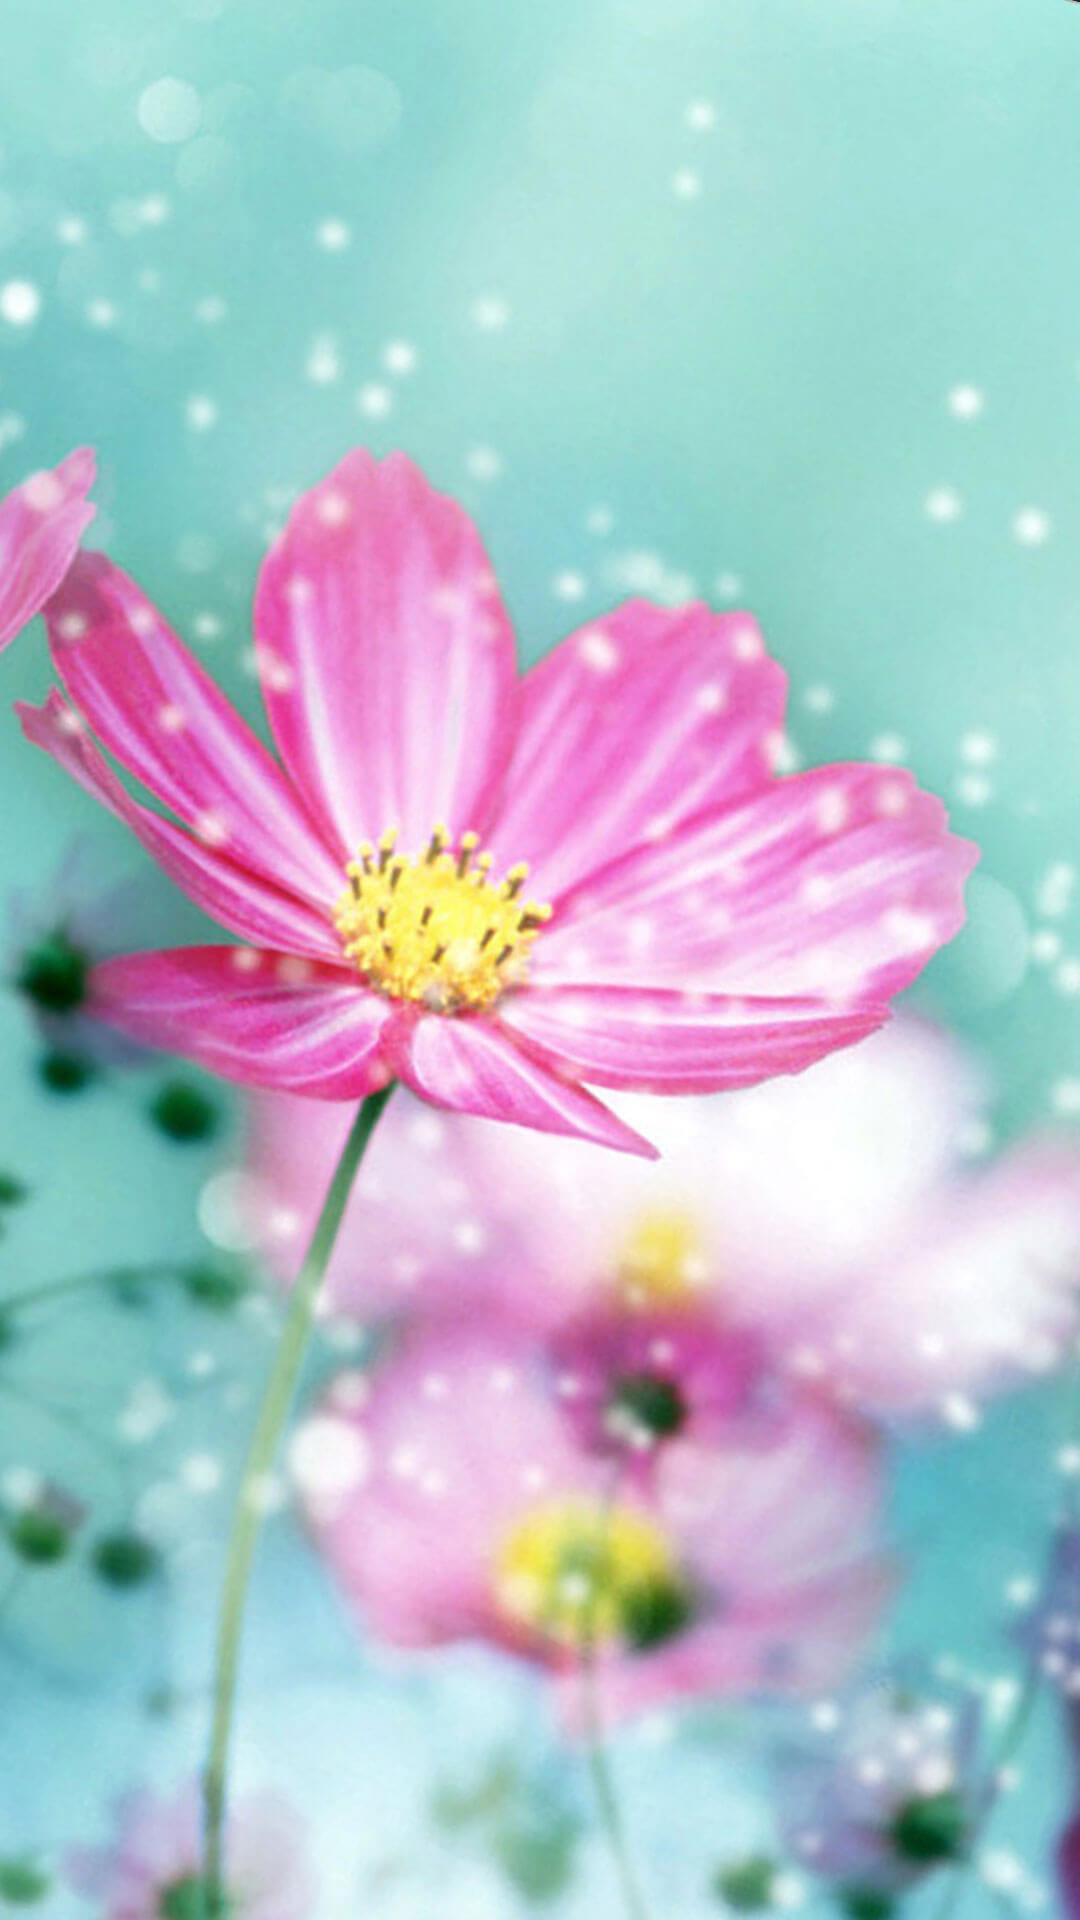 Spring Flower iPhone 6 Wallpaper HD